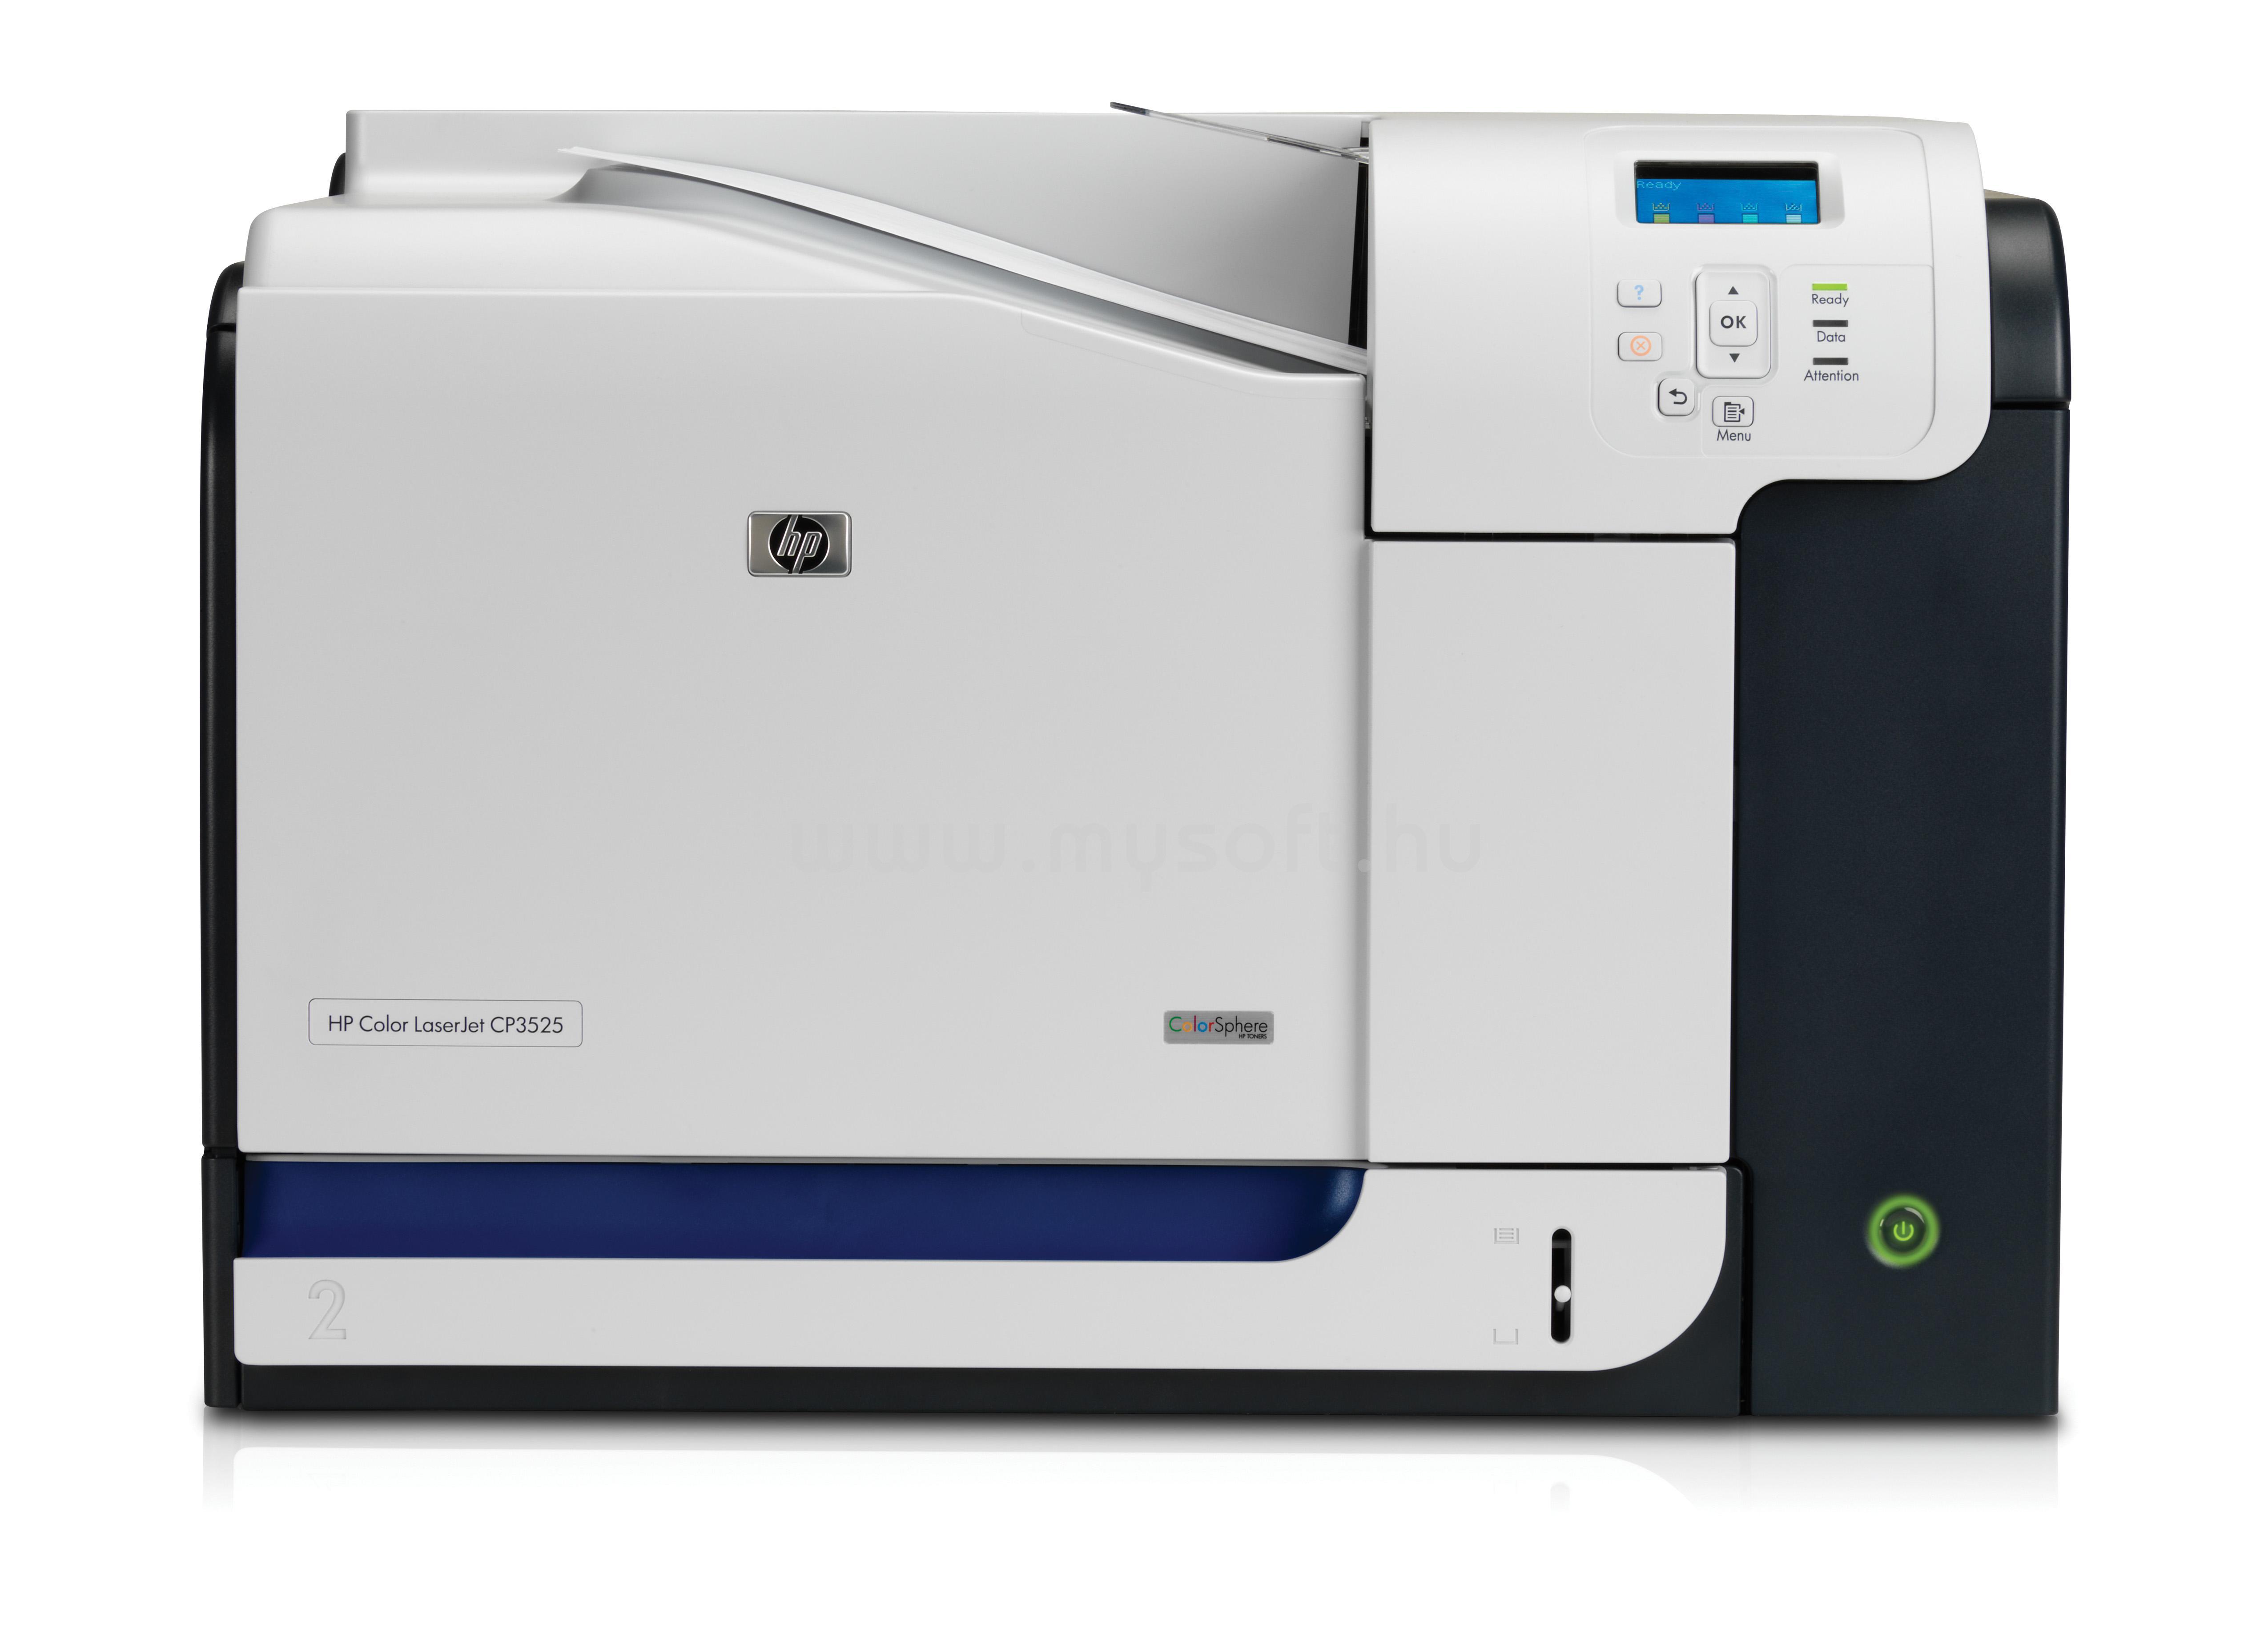 Color Laser Printer Reviews: HP CP3525Dn Color LaserJet Printer RECONDITIONED